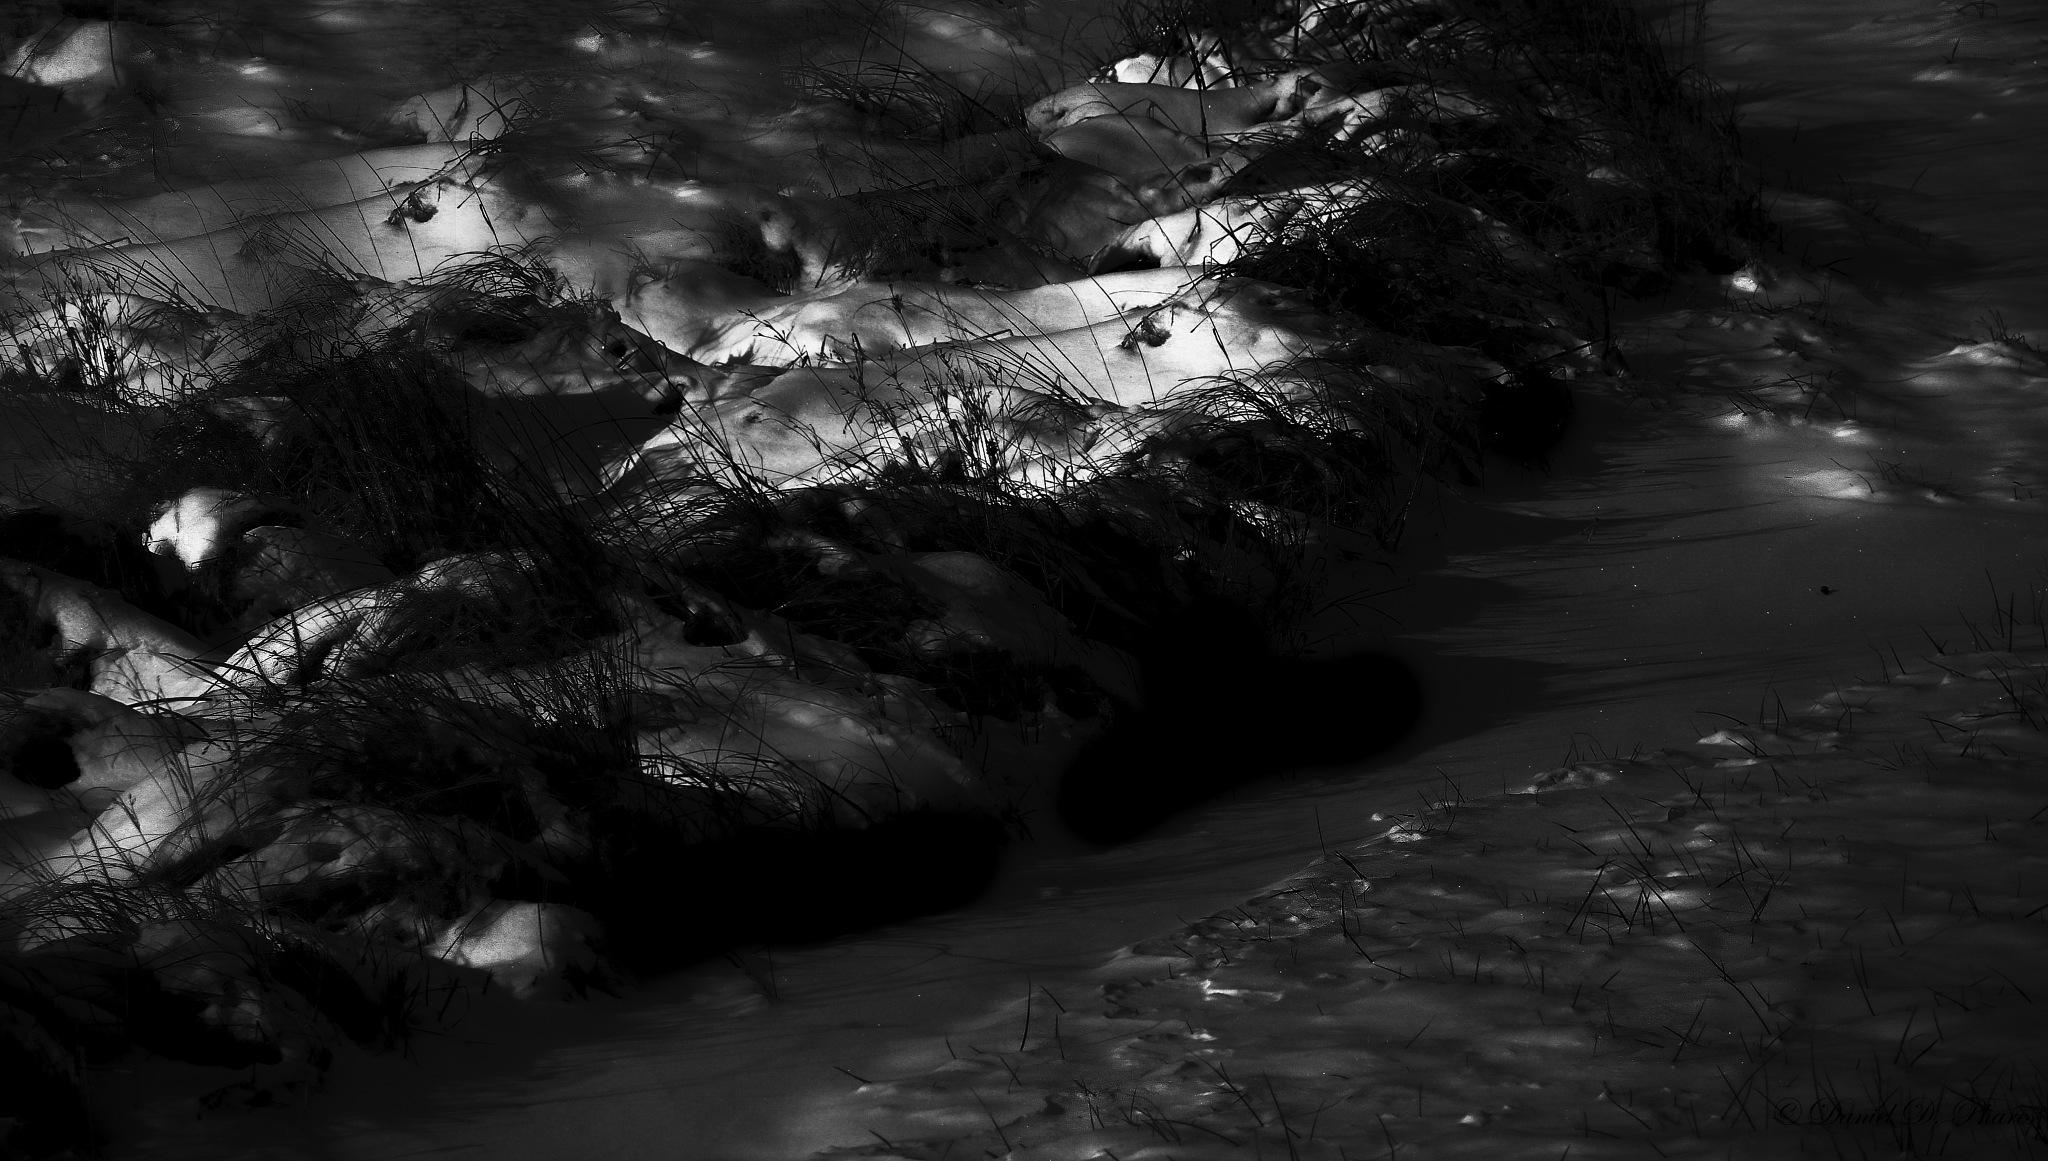 On Light's Edge by danphares